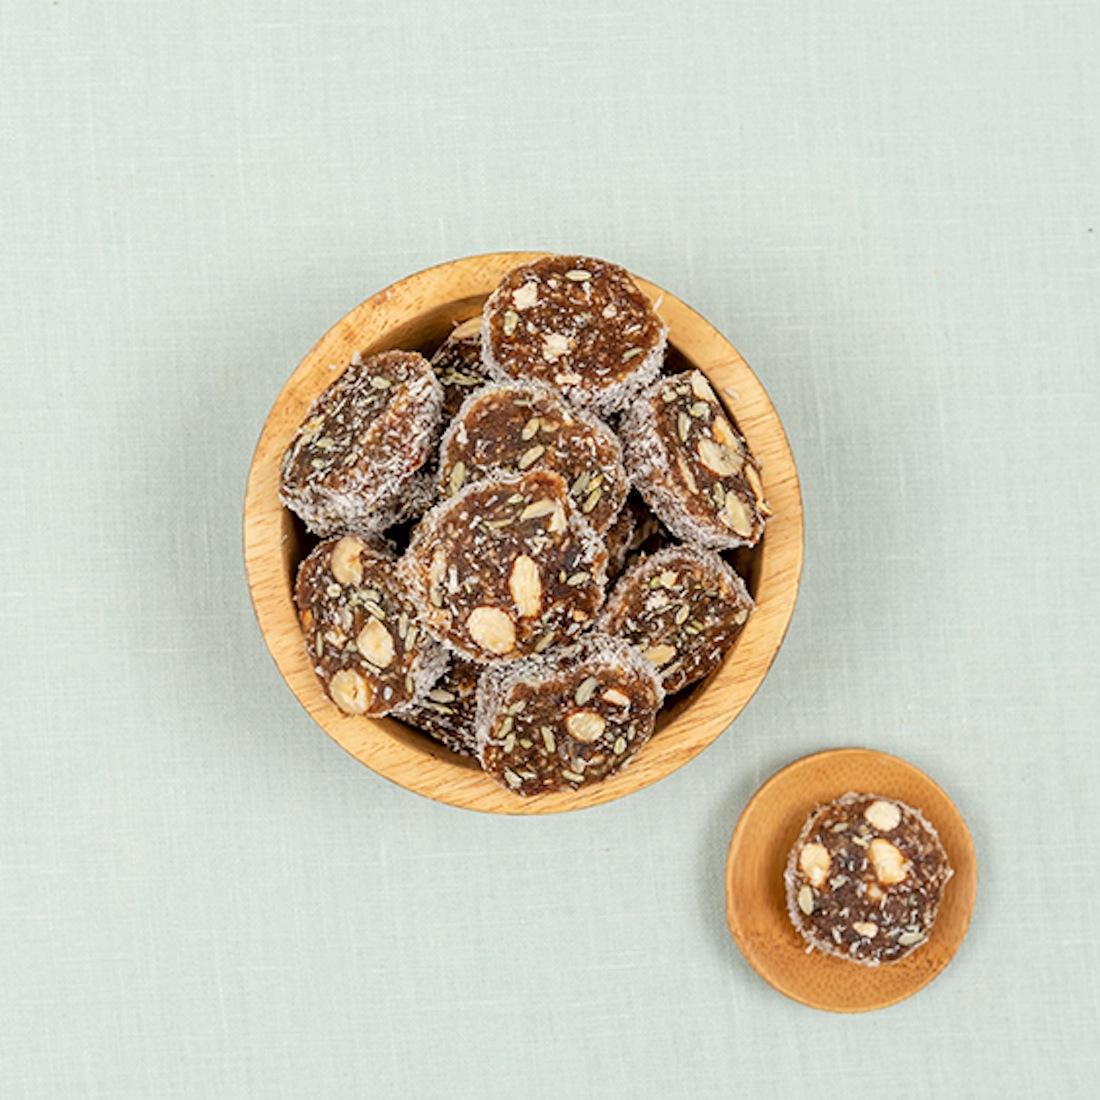 Dadel noten bites